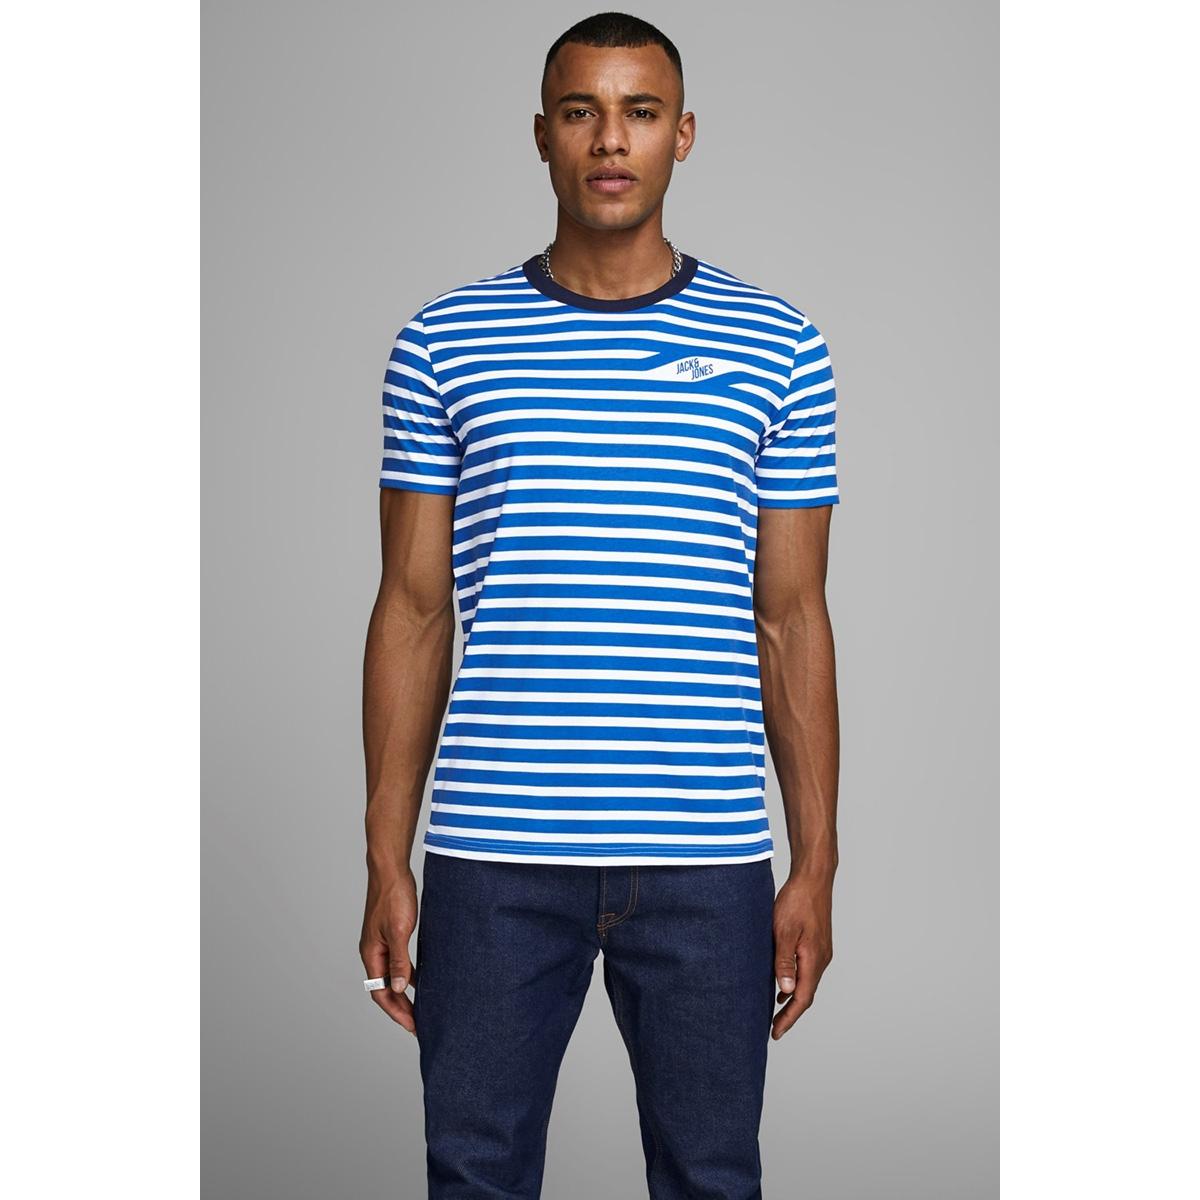 jcocraig tee ss crew neck 12155072 jack & jones t-shirt victoria blue/slim